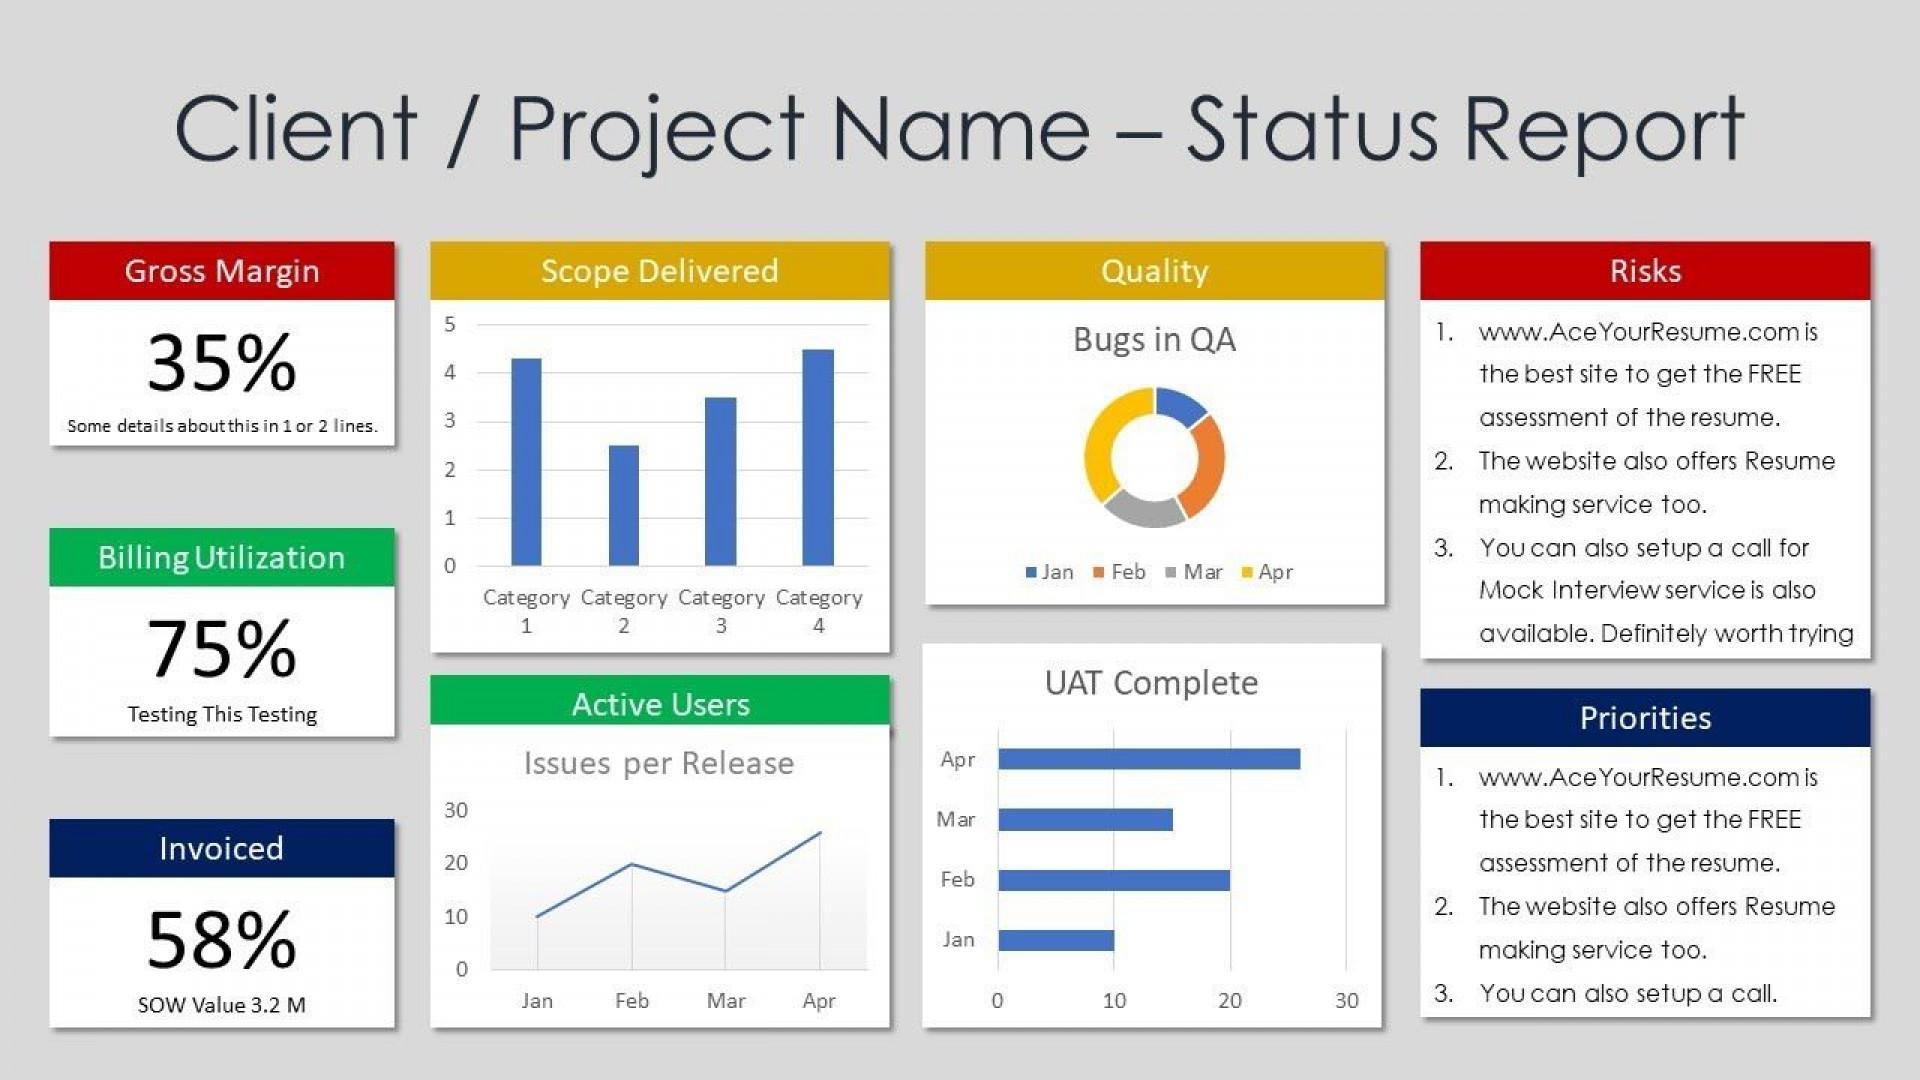 002 Outstanding Project Management Statu Report Template Excel Sample  Gantt 2016 Progres1920